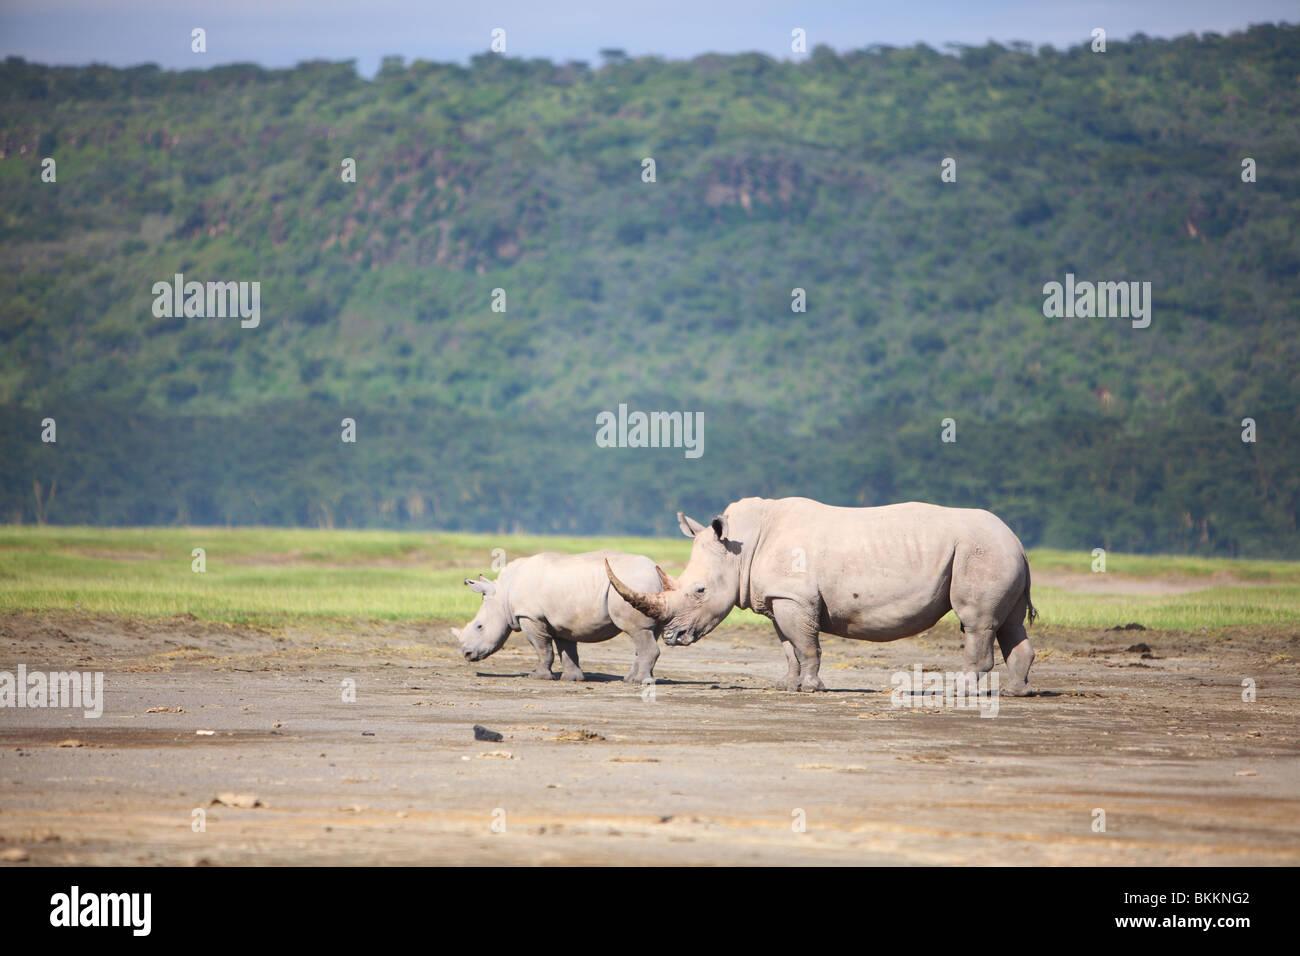 Kenya, Parc national du lac Nakuru, Rhino, rhinocéros blanc, Ceratotherium simum Banque D'Images